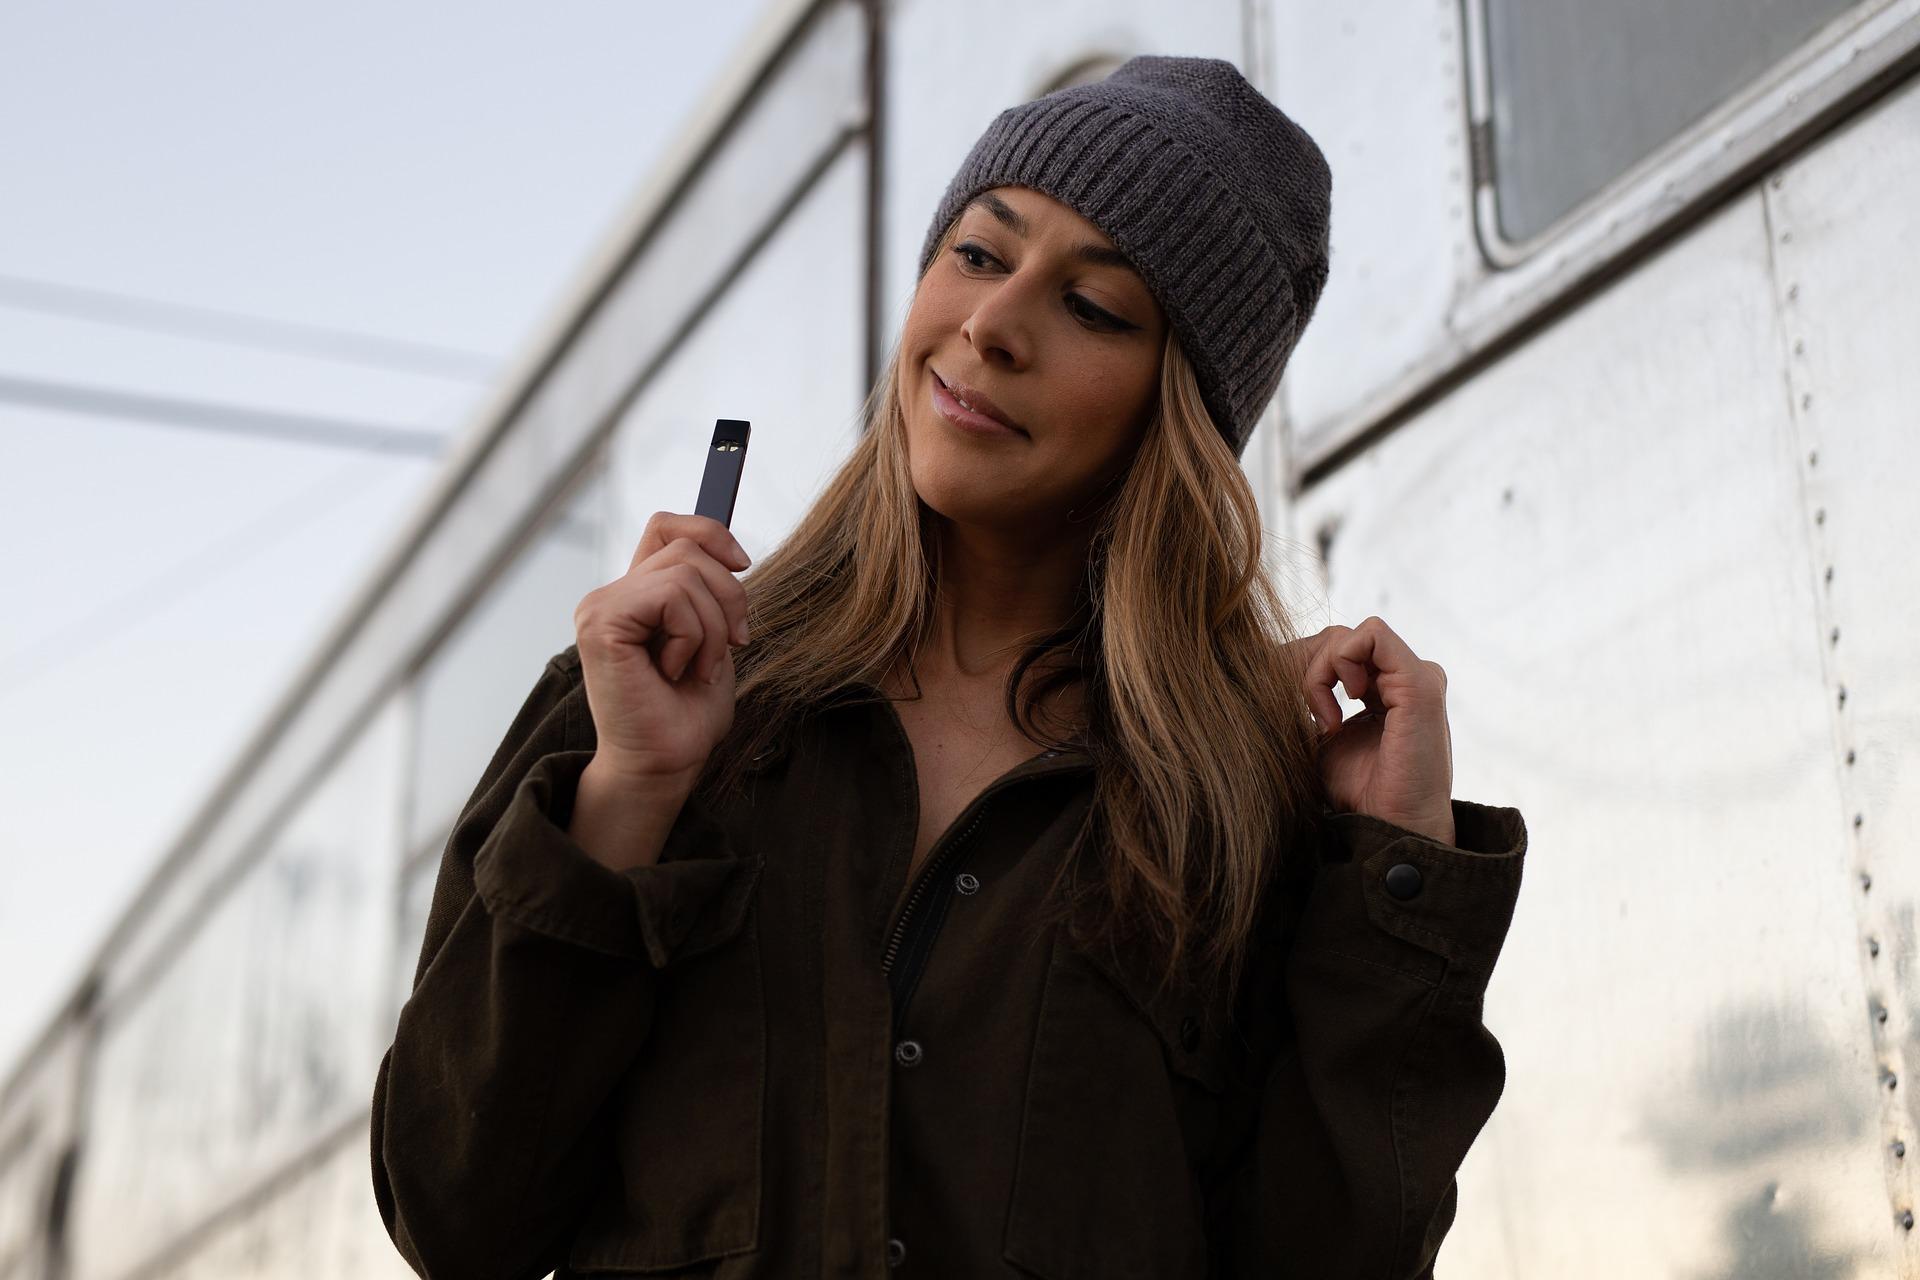 La e cigarette ultra populaire chez les